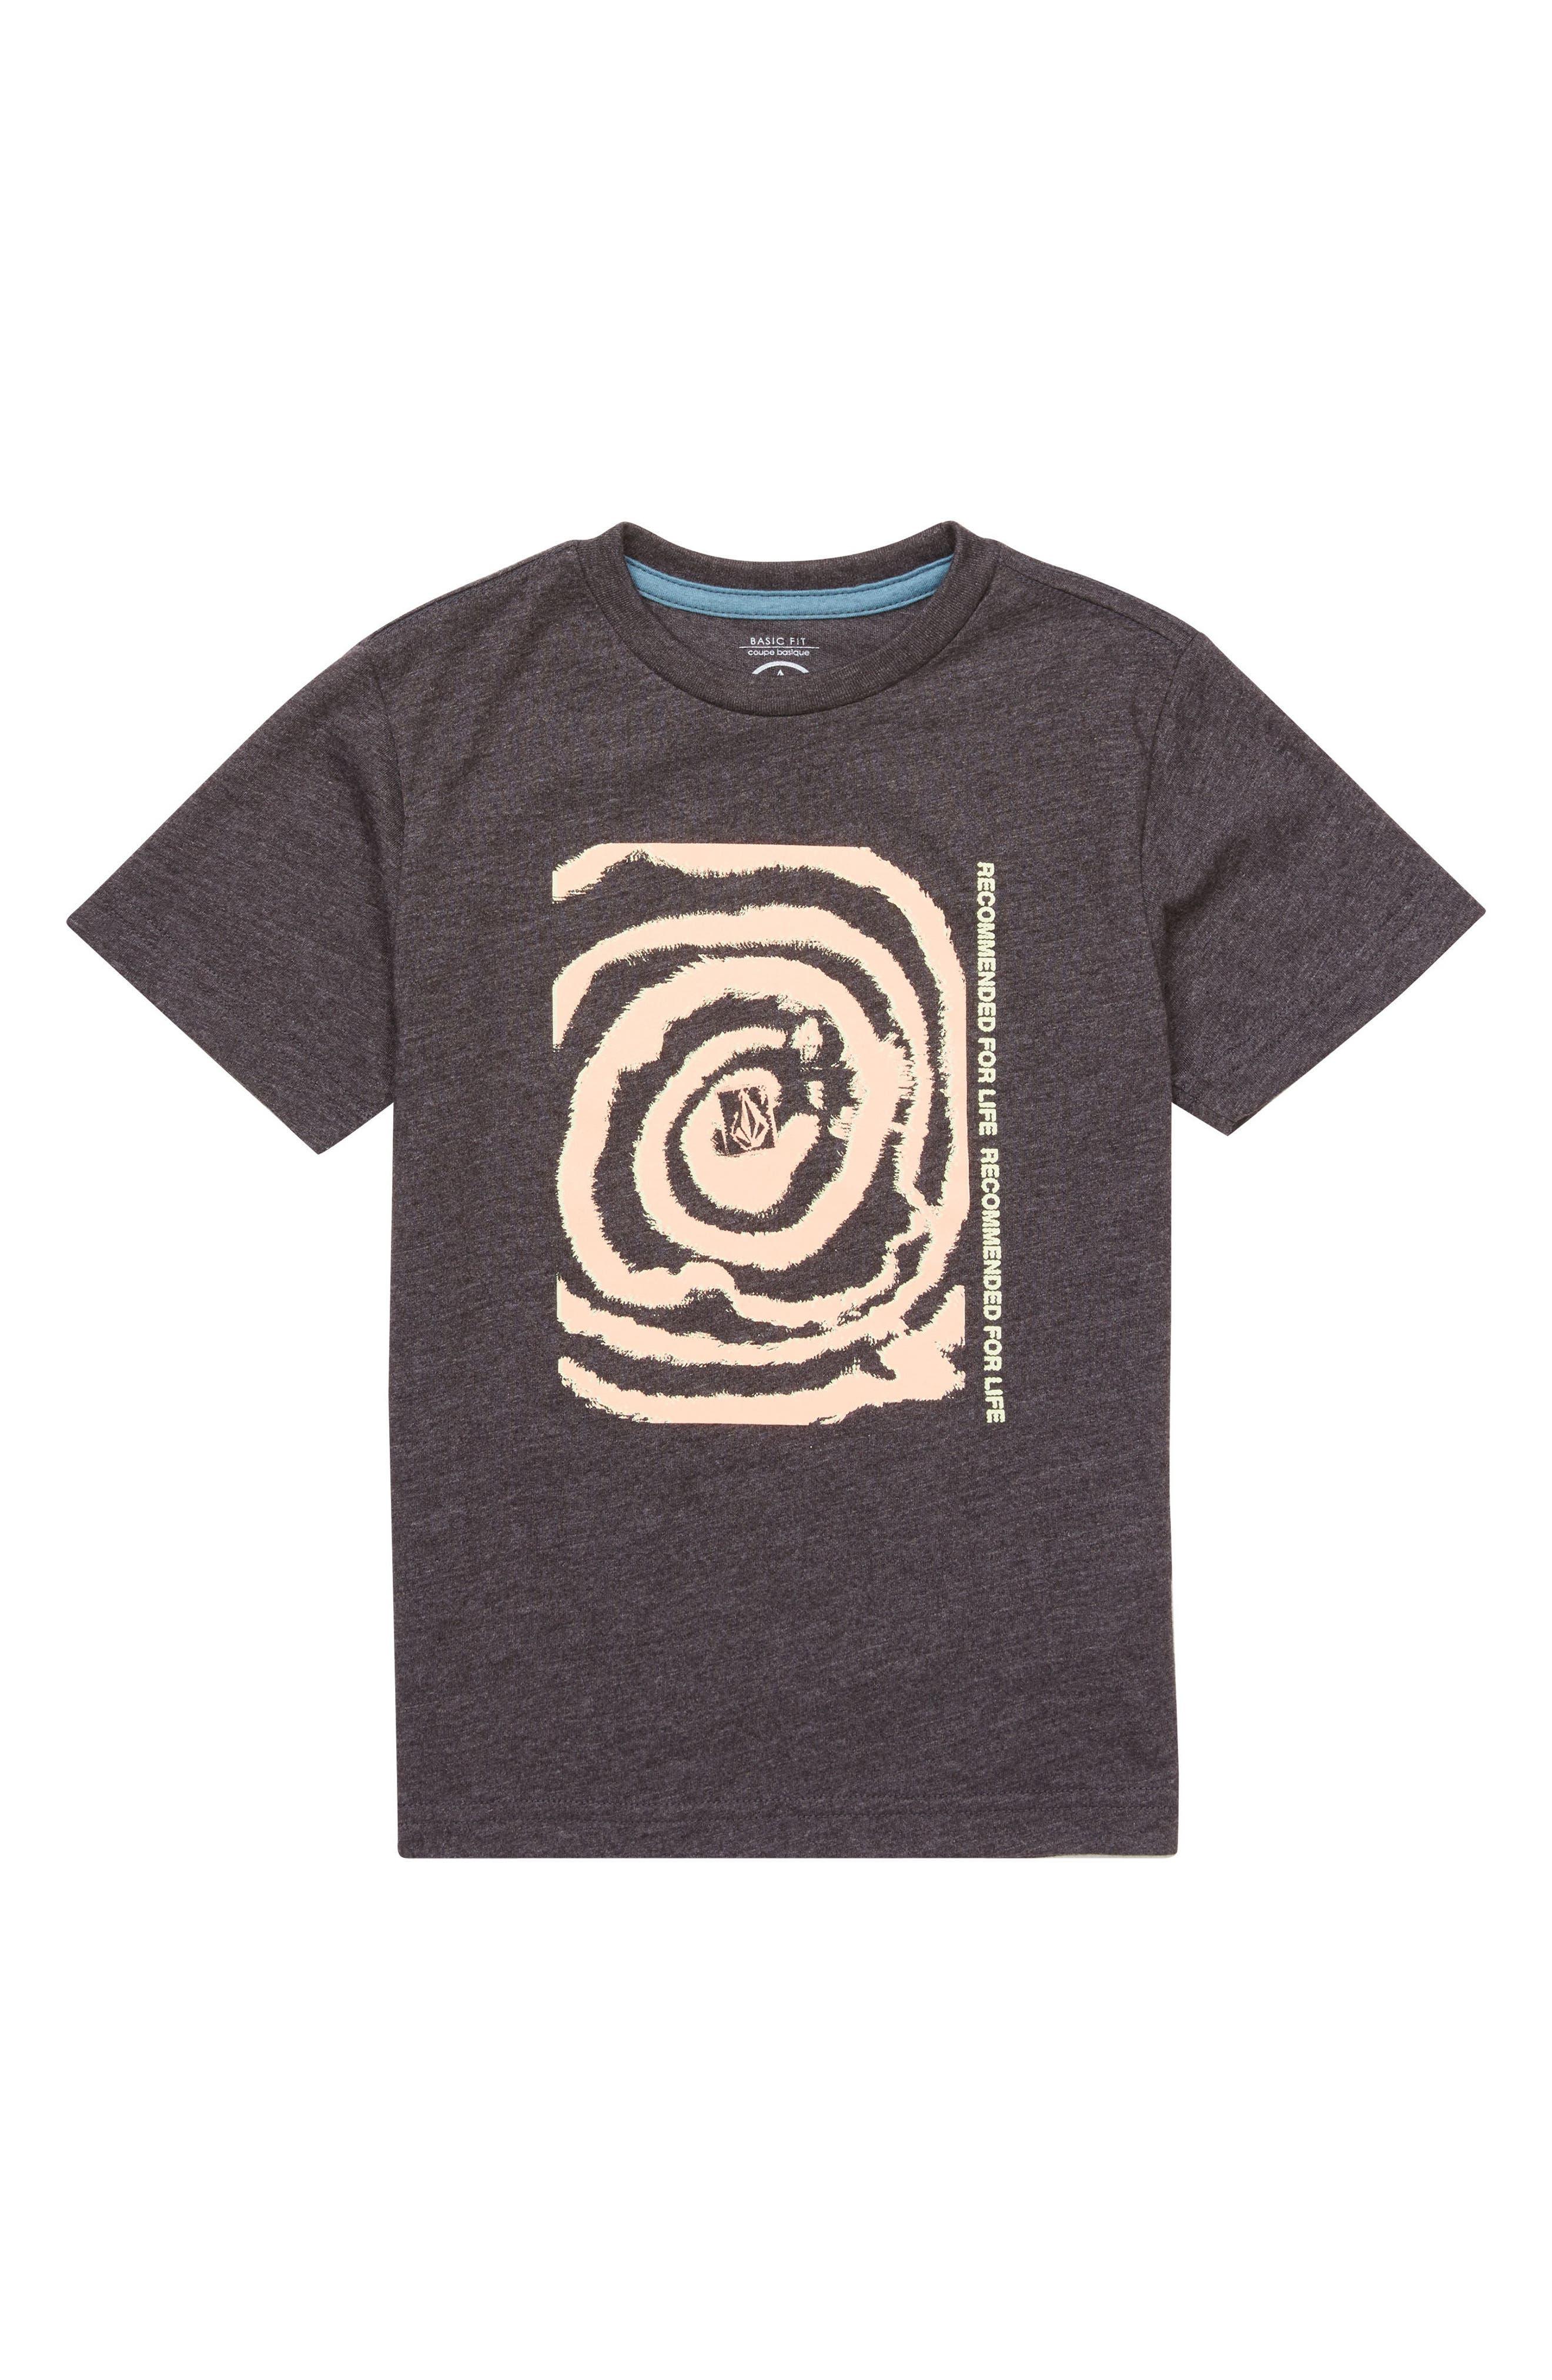 Volcom Maag Graphic T-Shirt (Toddler Boys & Little Boys)